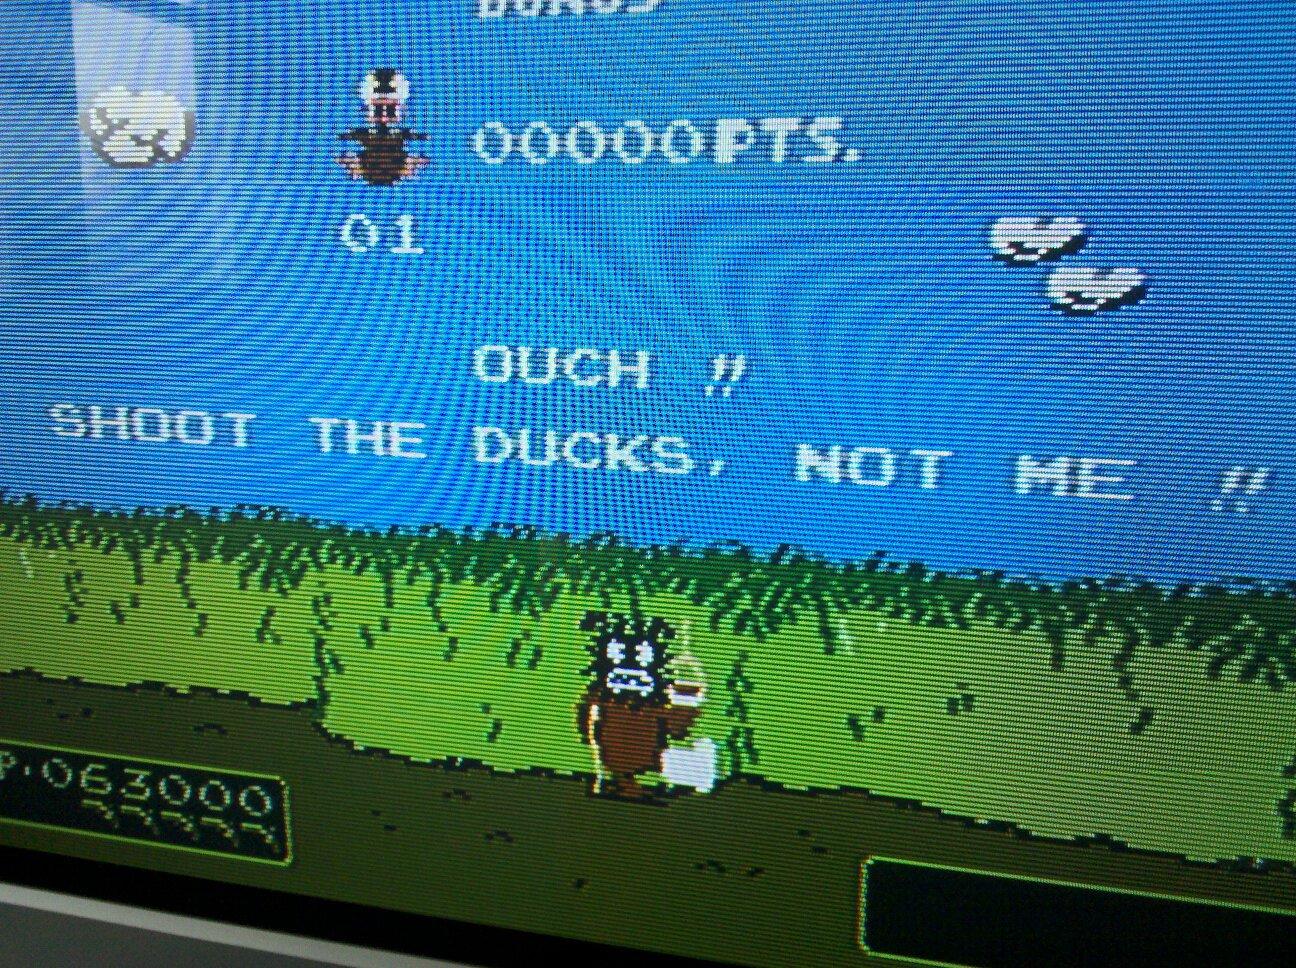 Duck Hunt Arcade Version